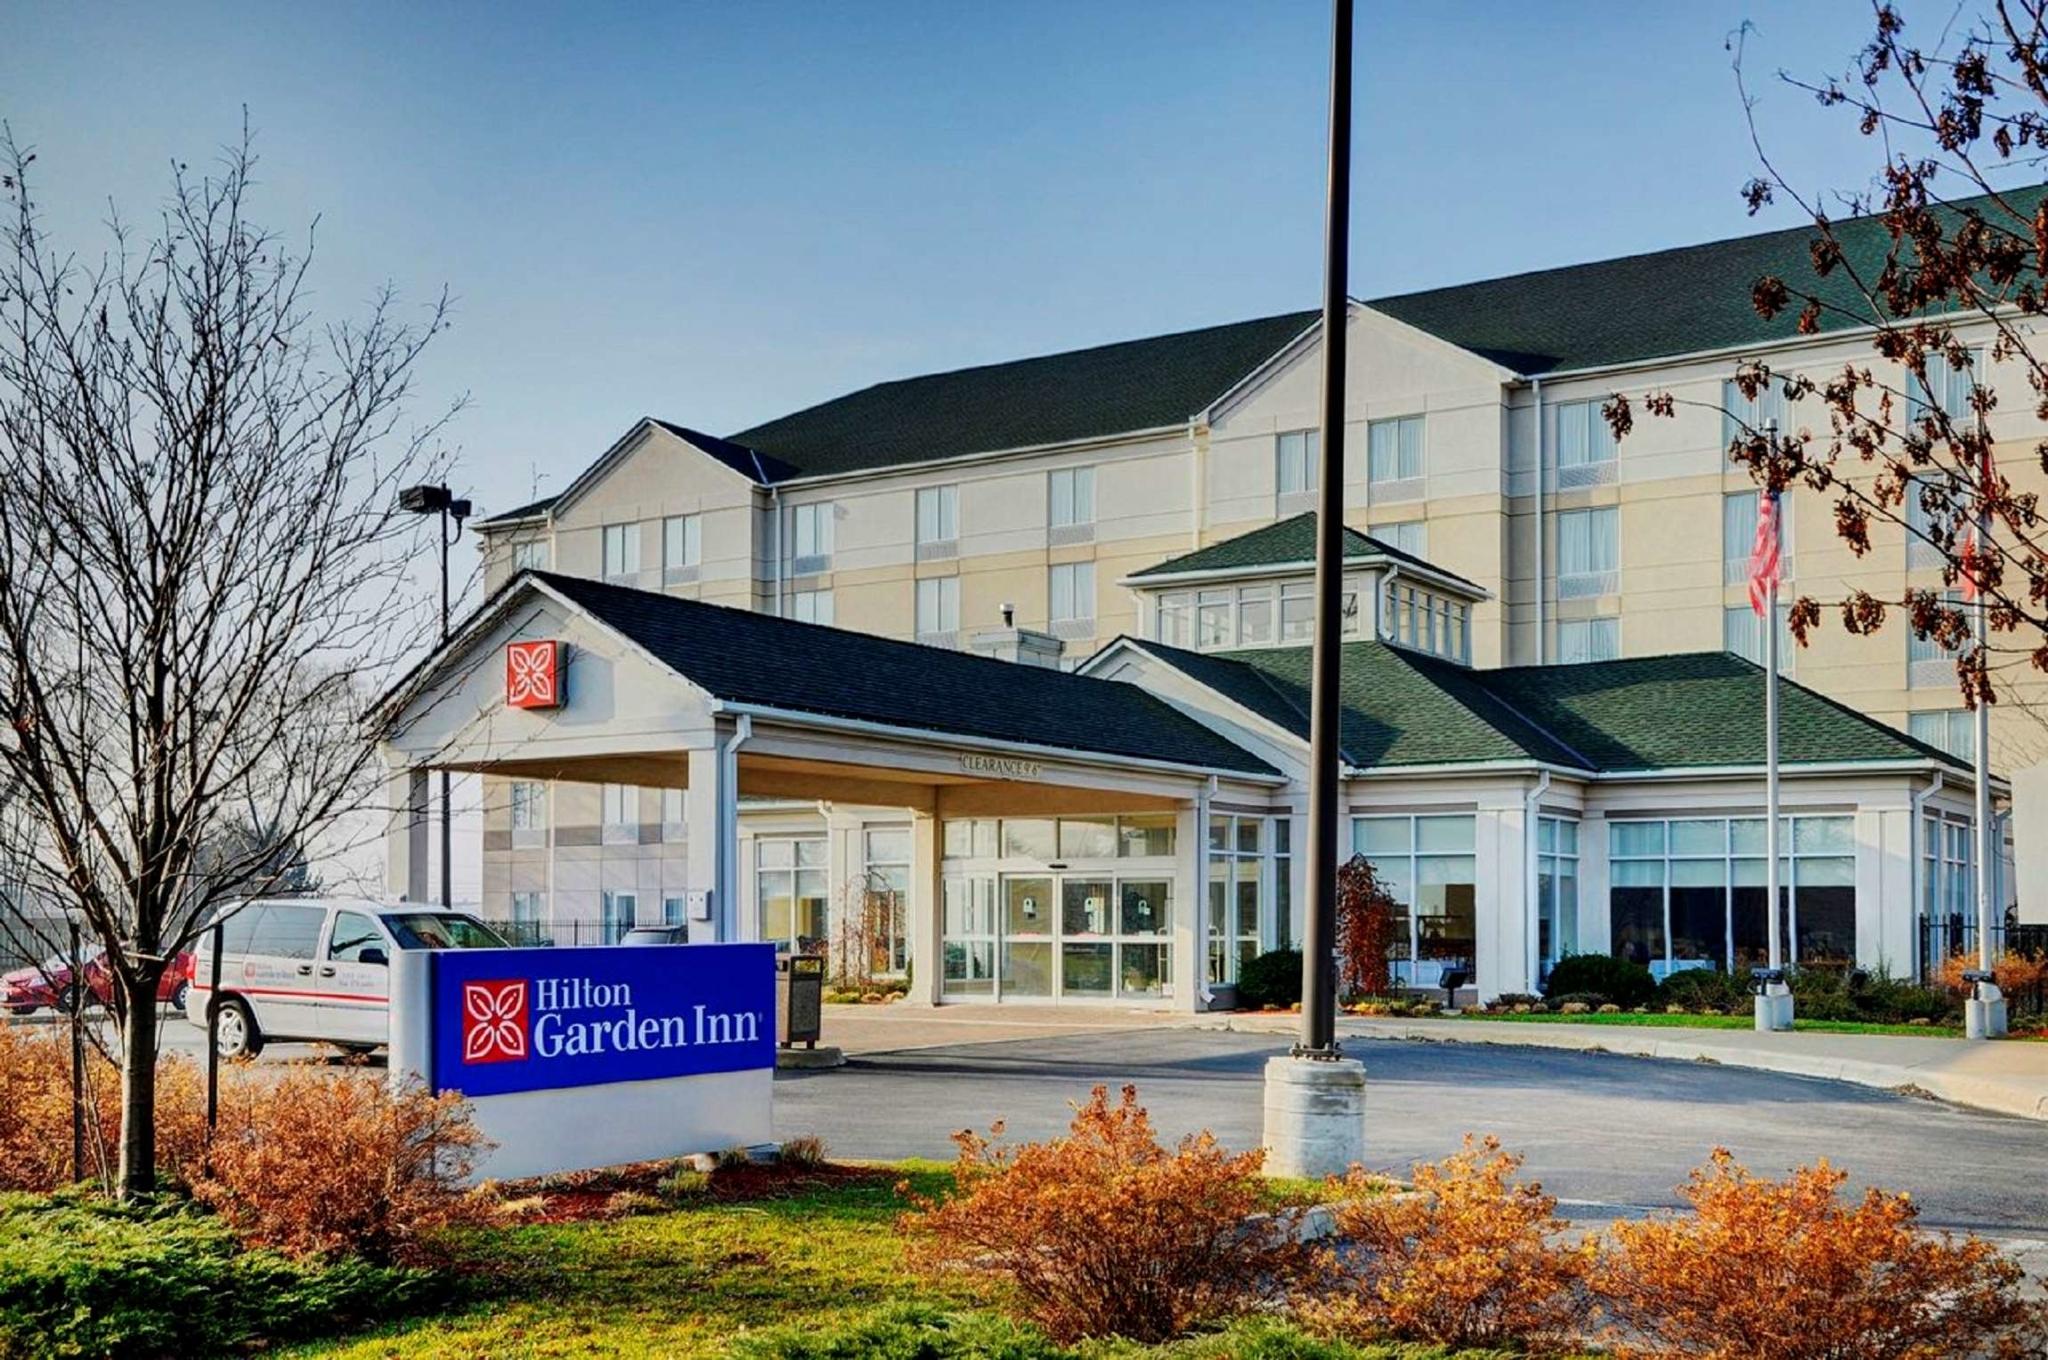 Hilton Garden Inn Kitchener/Cambridge - Hotels